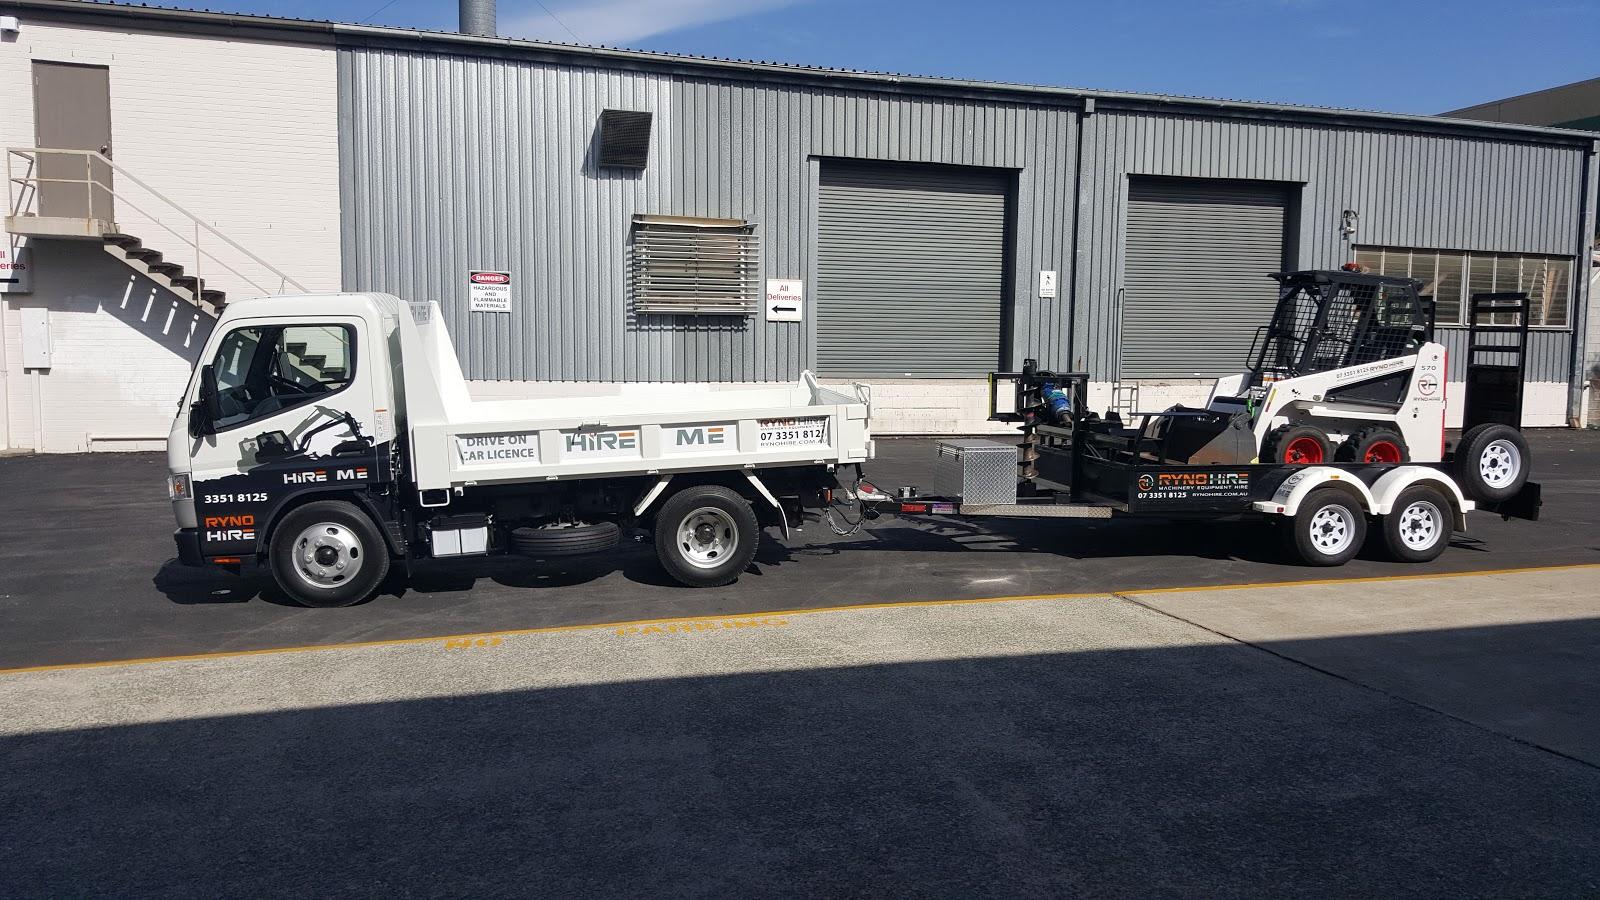 tipper truck towing skid steer loader